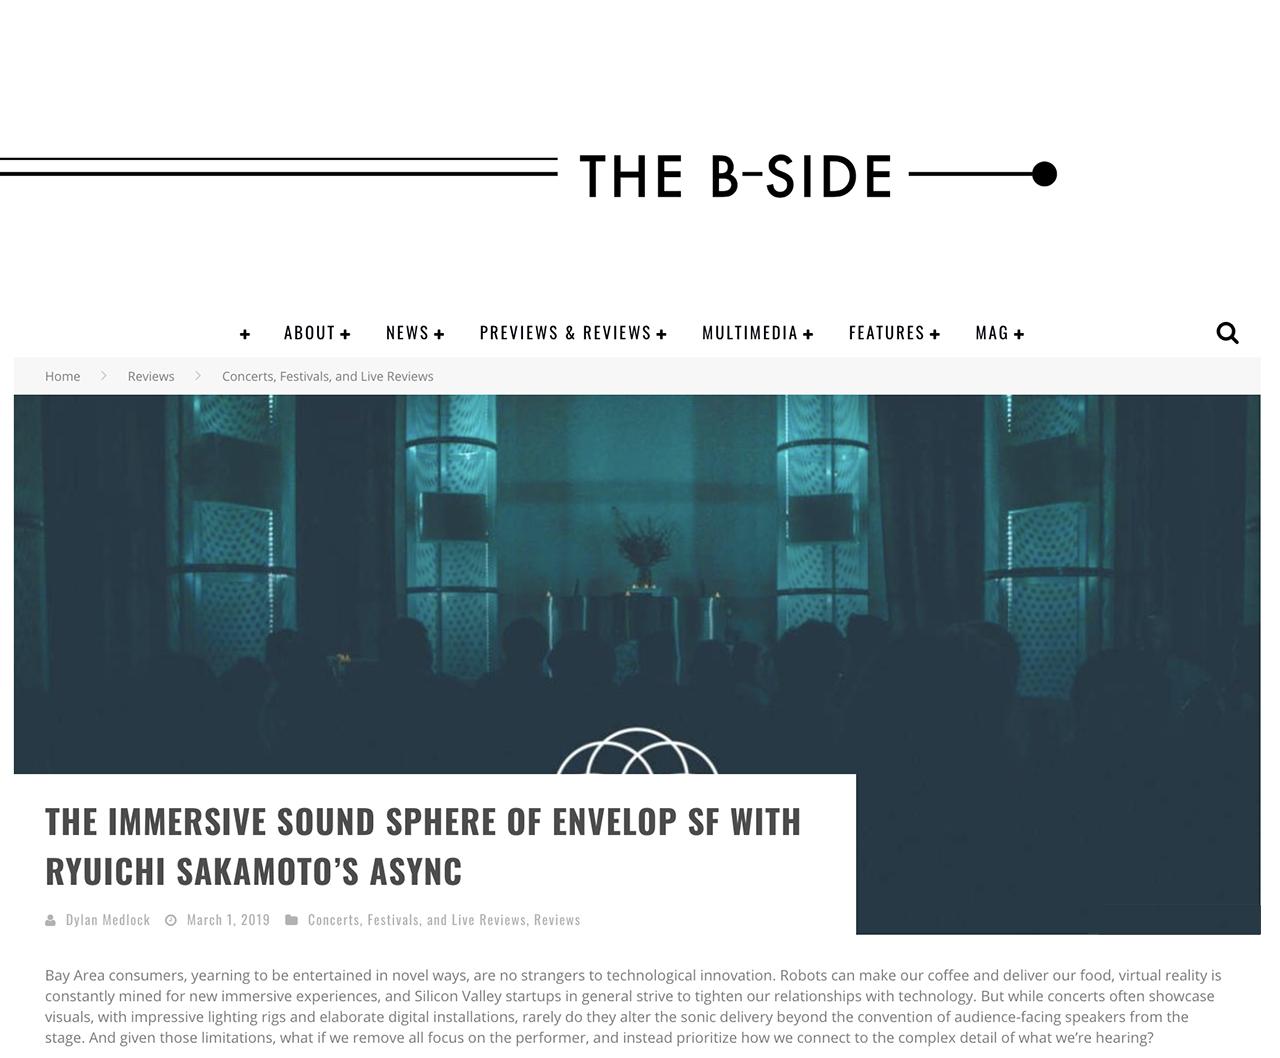 b-side-envelop_20190301.jpg